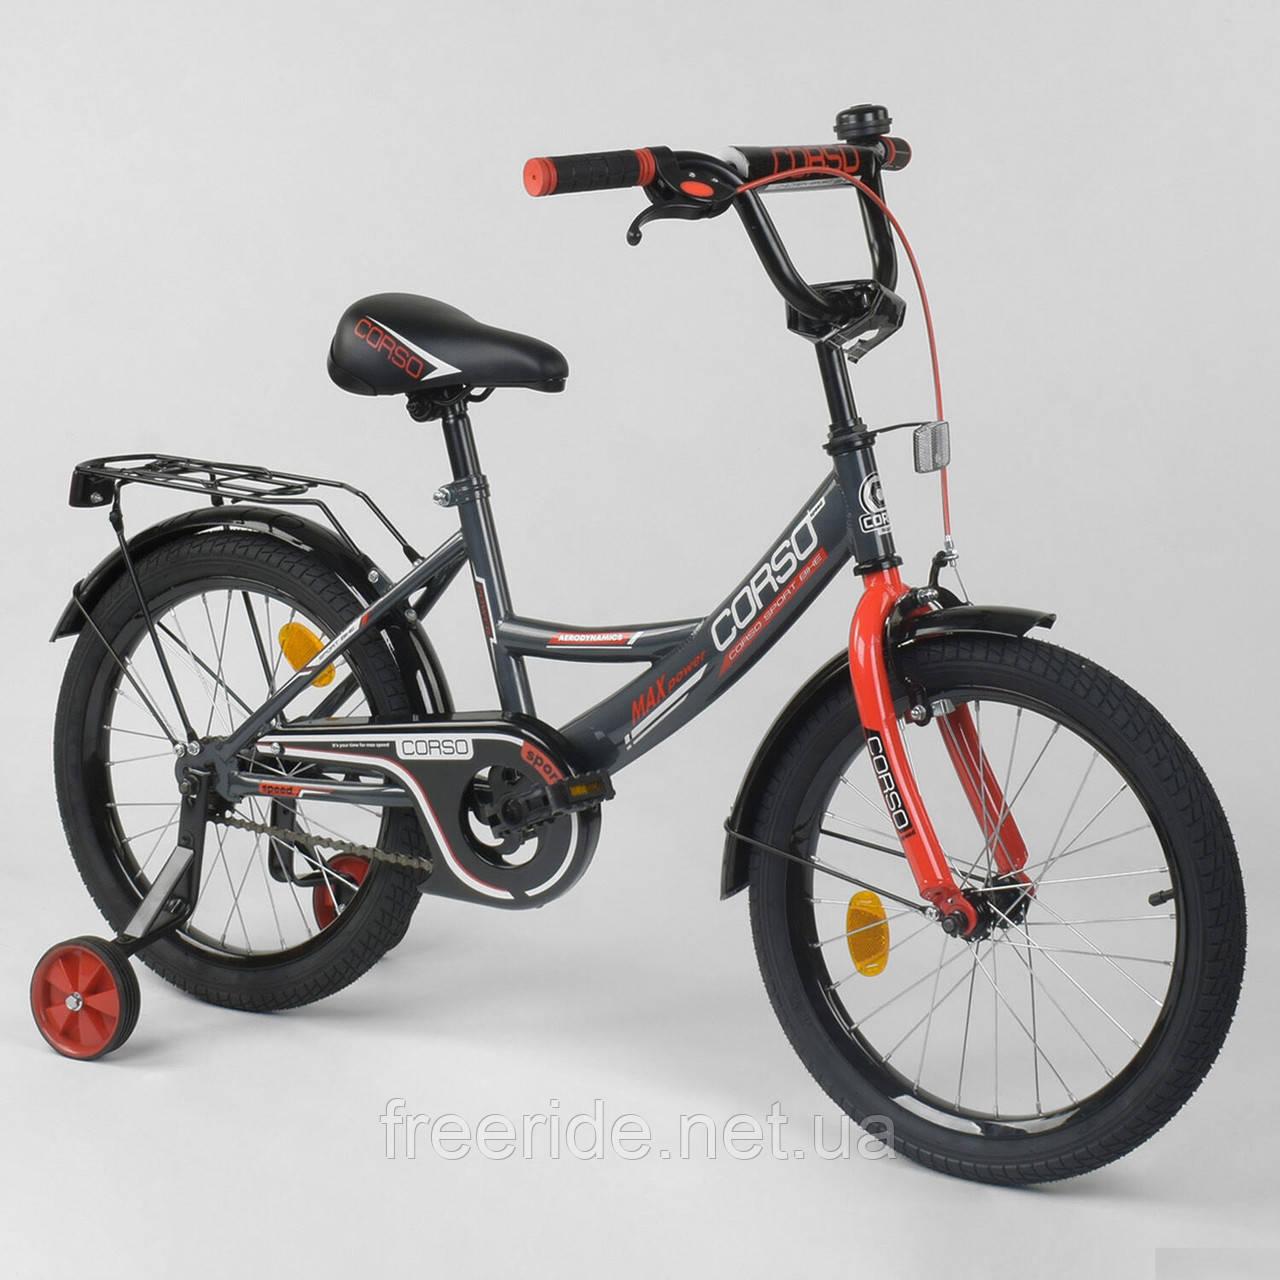 Детский Велосипед CORSO CL-18 R